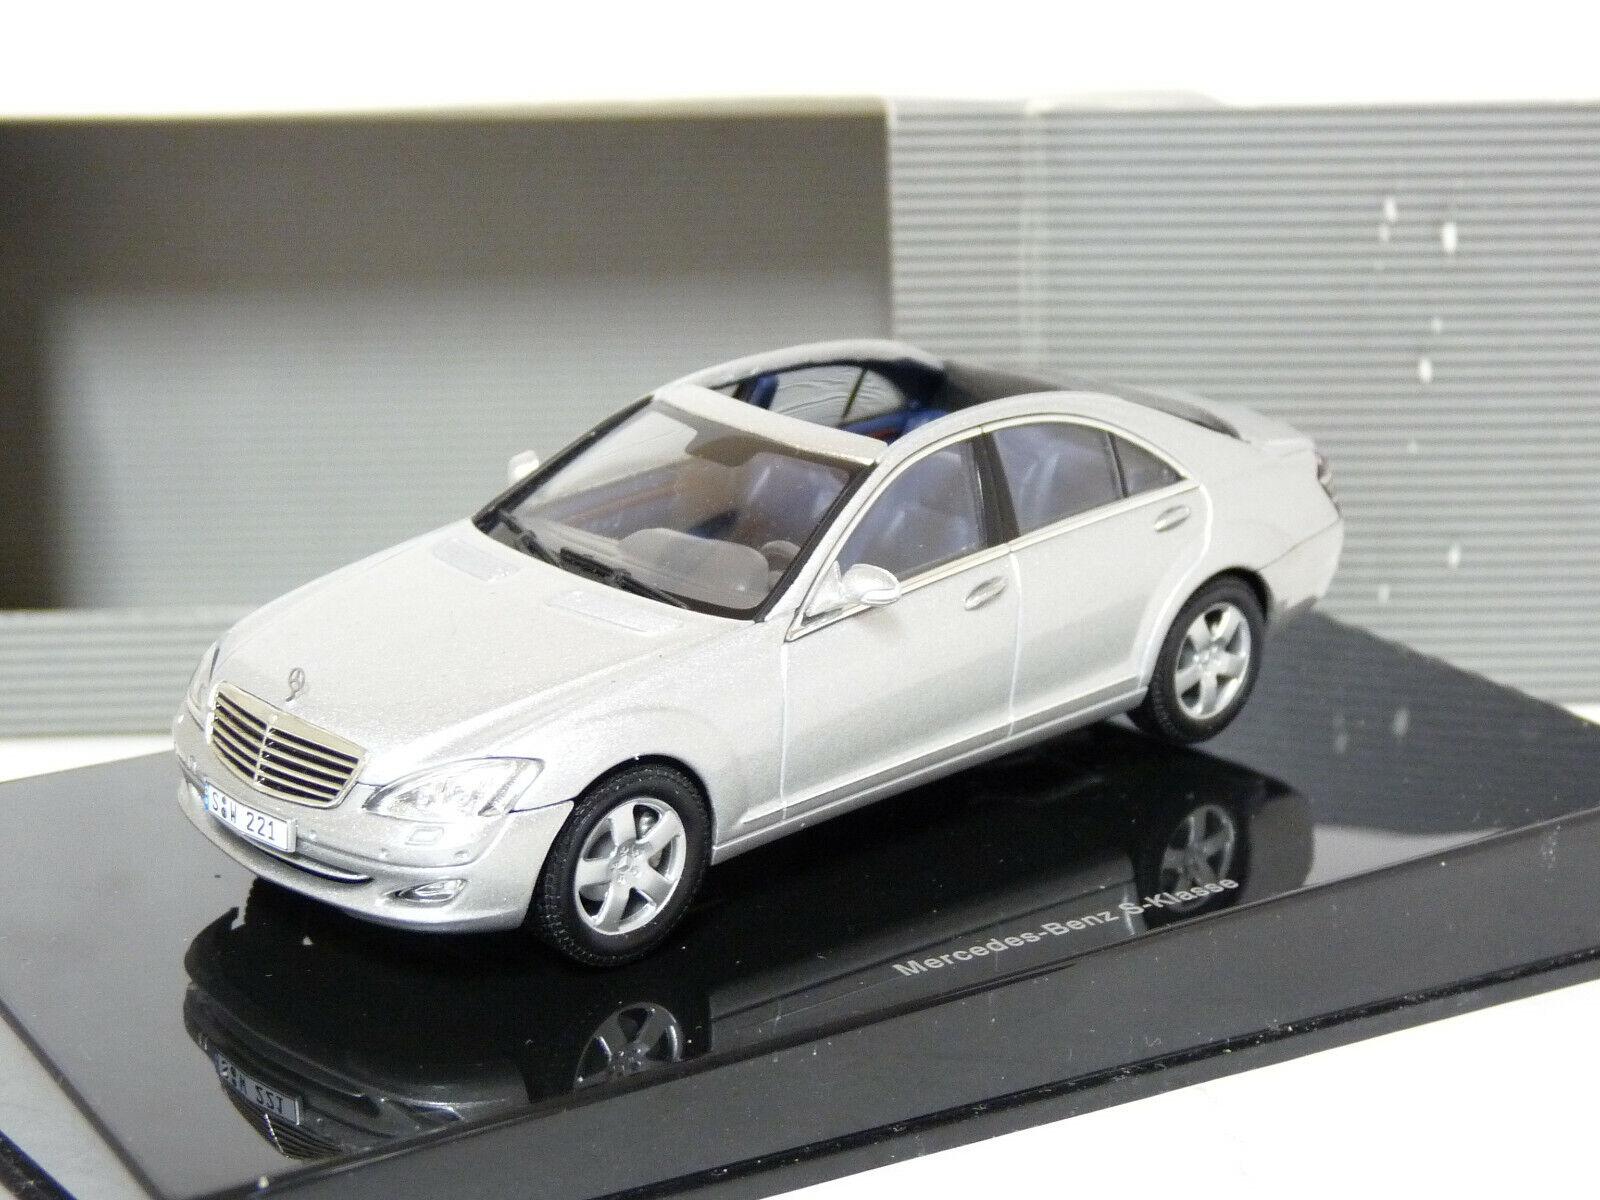 Autoart Unique 1 43 Mercedes-Benz S500 W221 ConGrünible Handmade Diecast Model